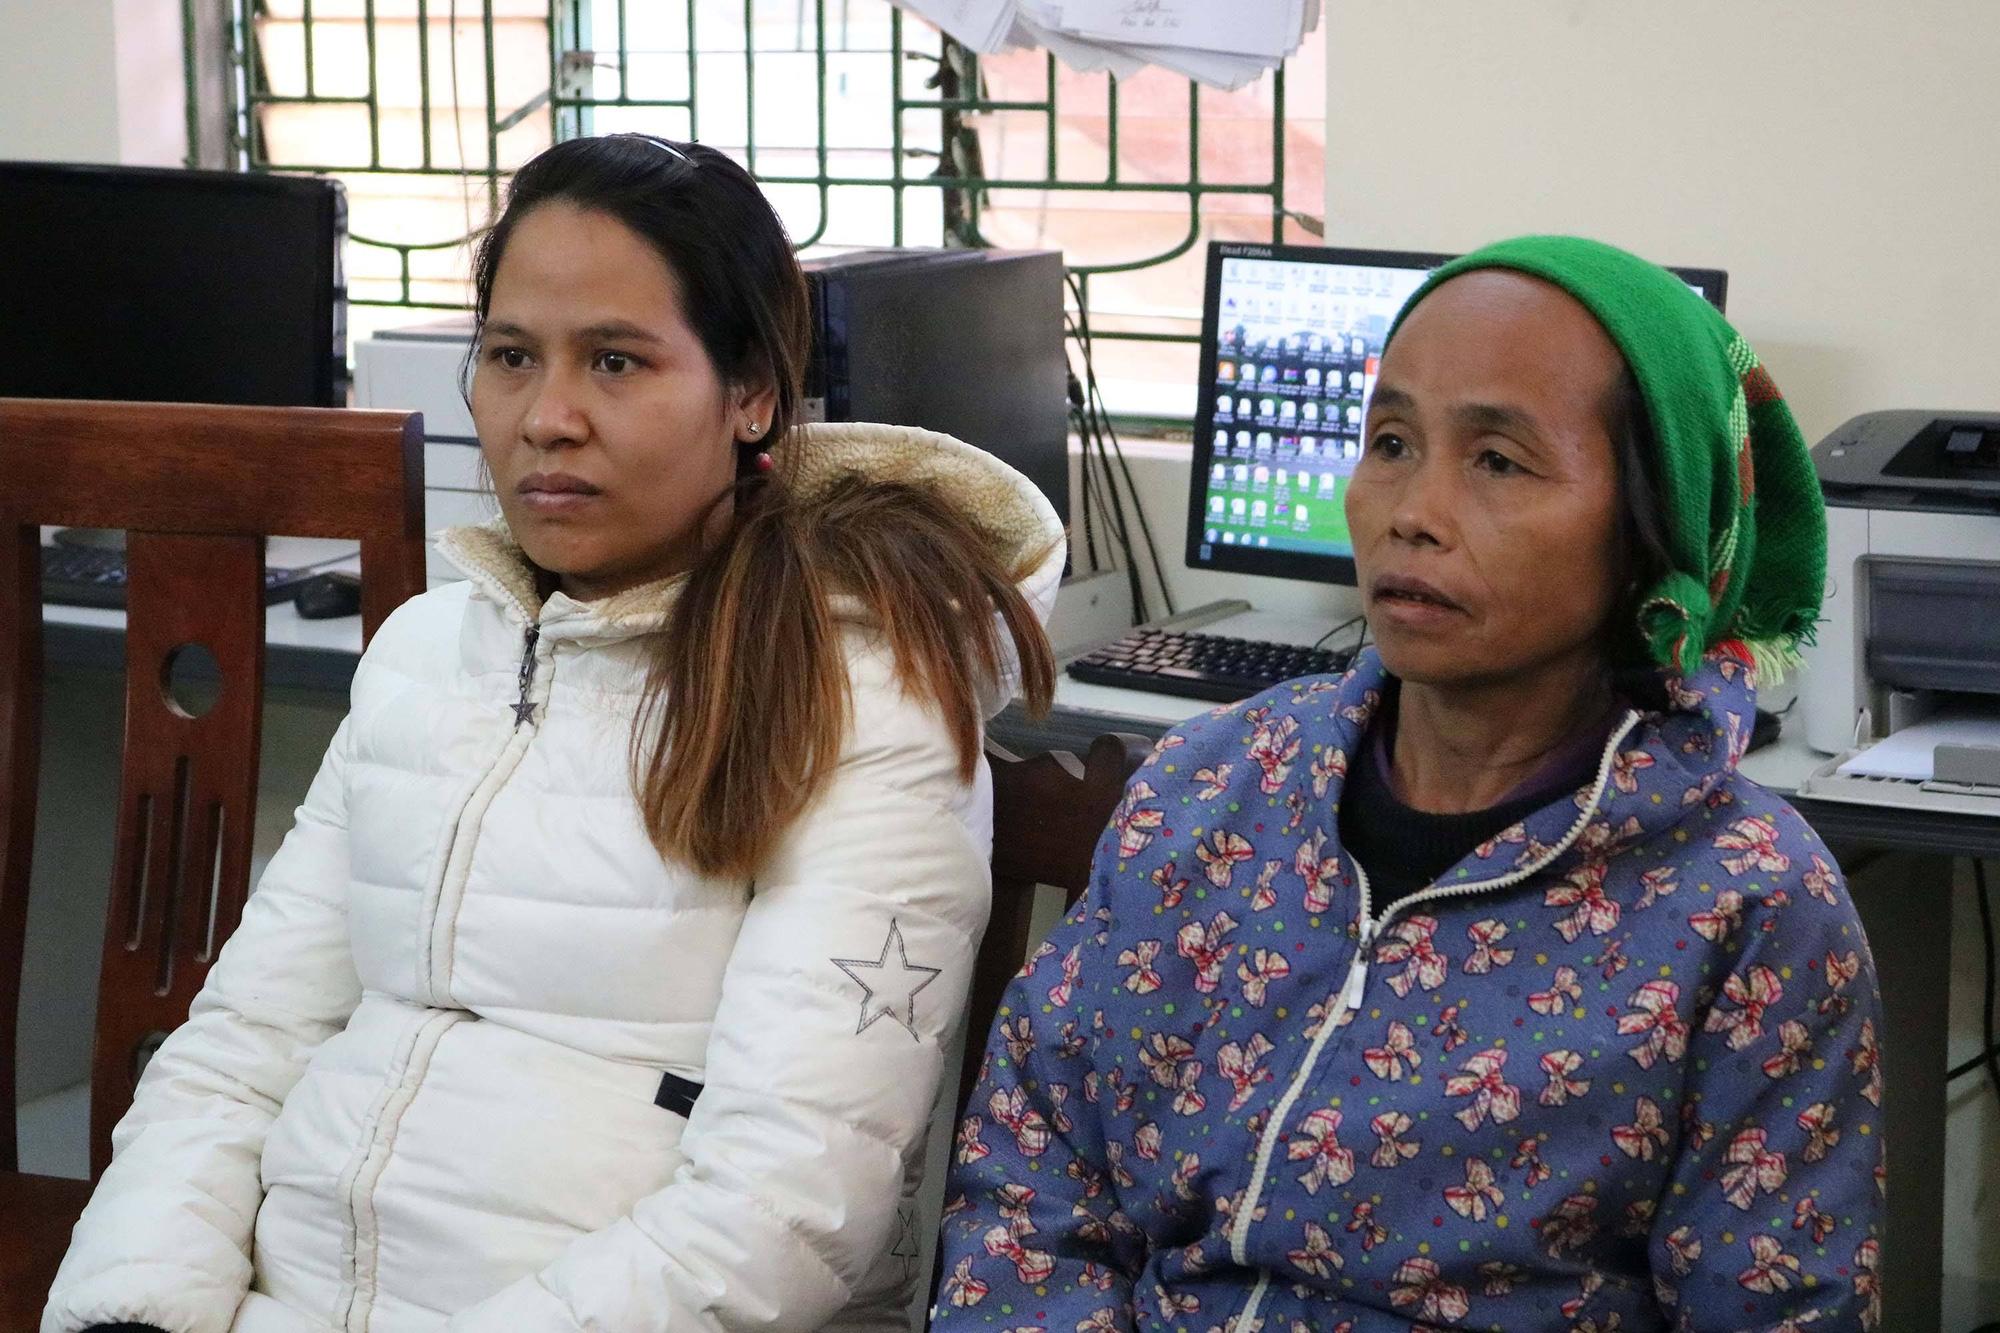 Newborns for sale in Vietnam: When victim becomes dealer